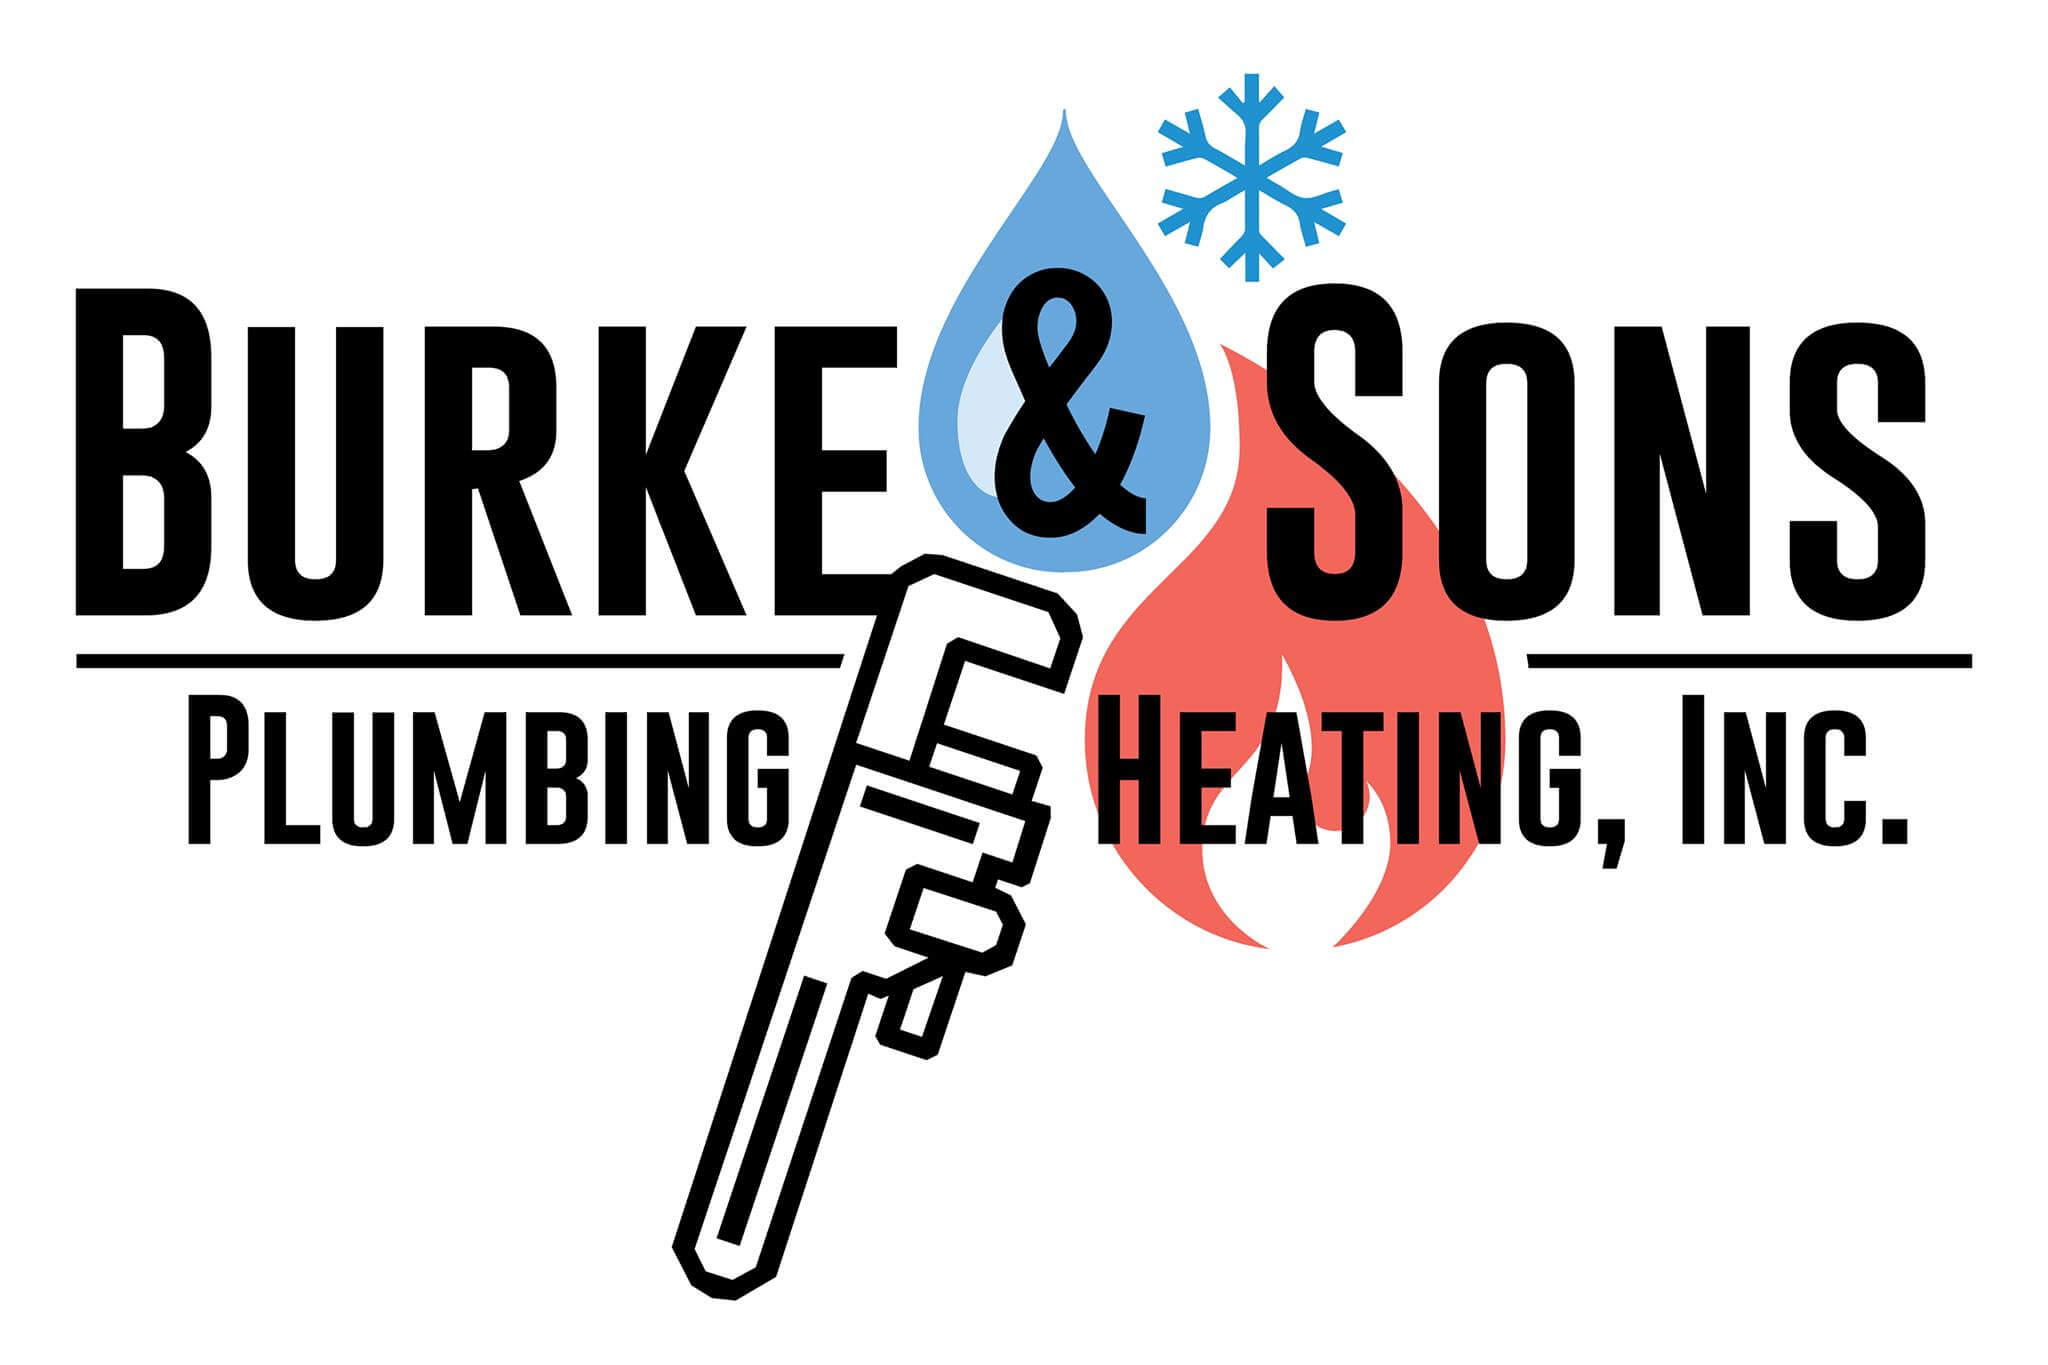 Burke & Sons Plumbing & Heating